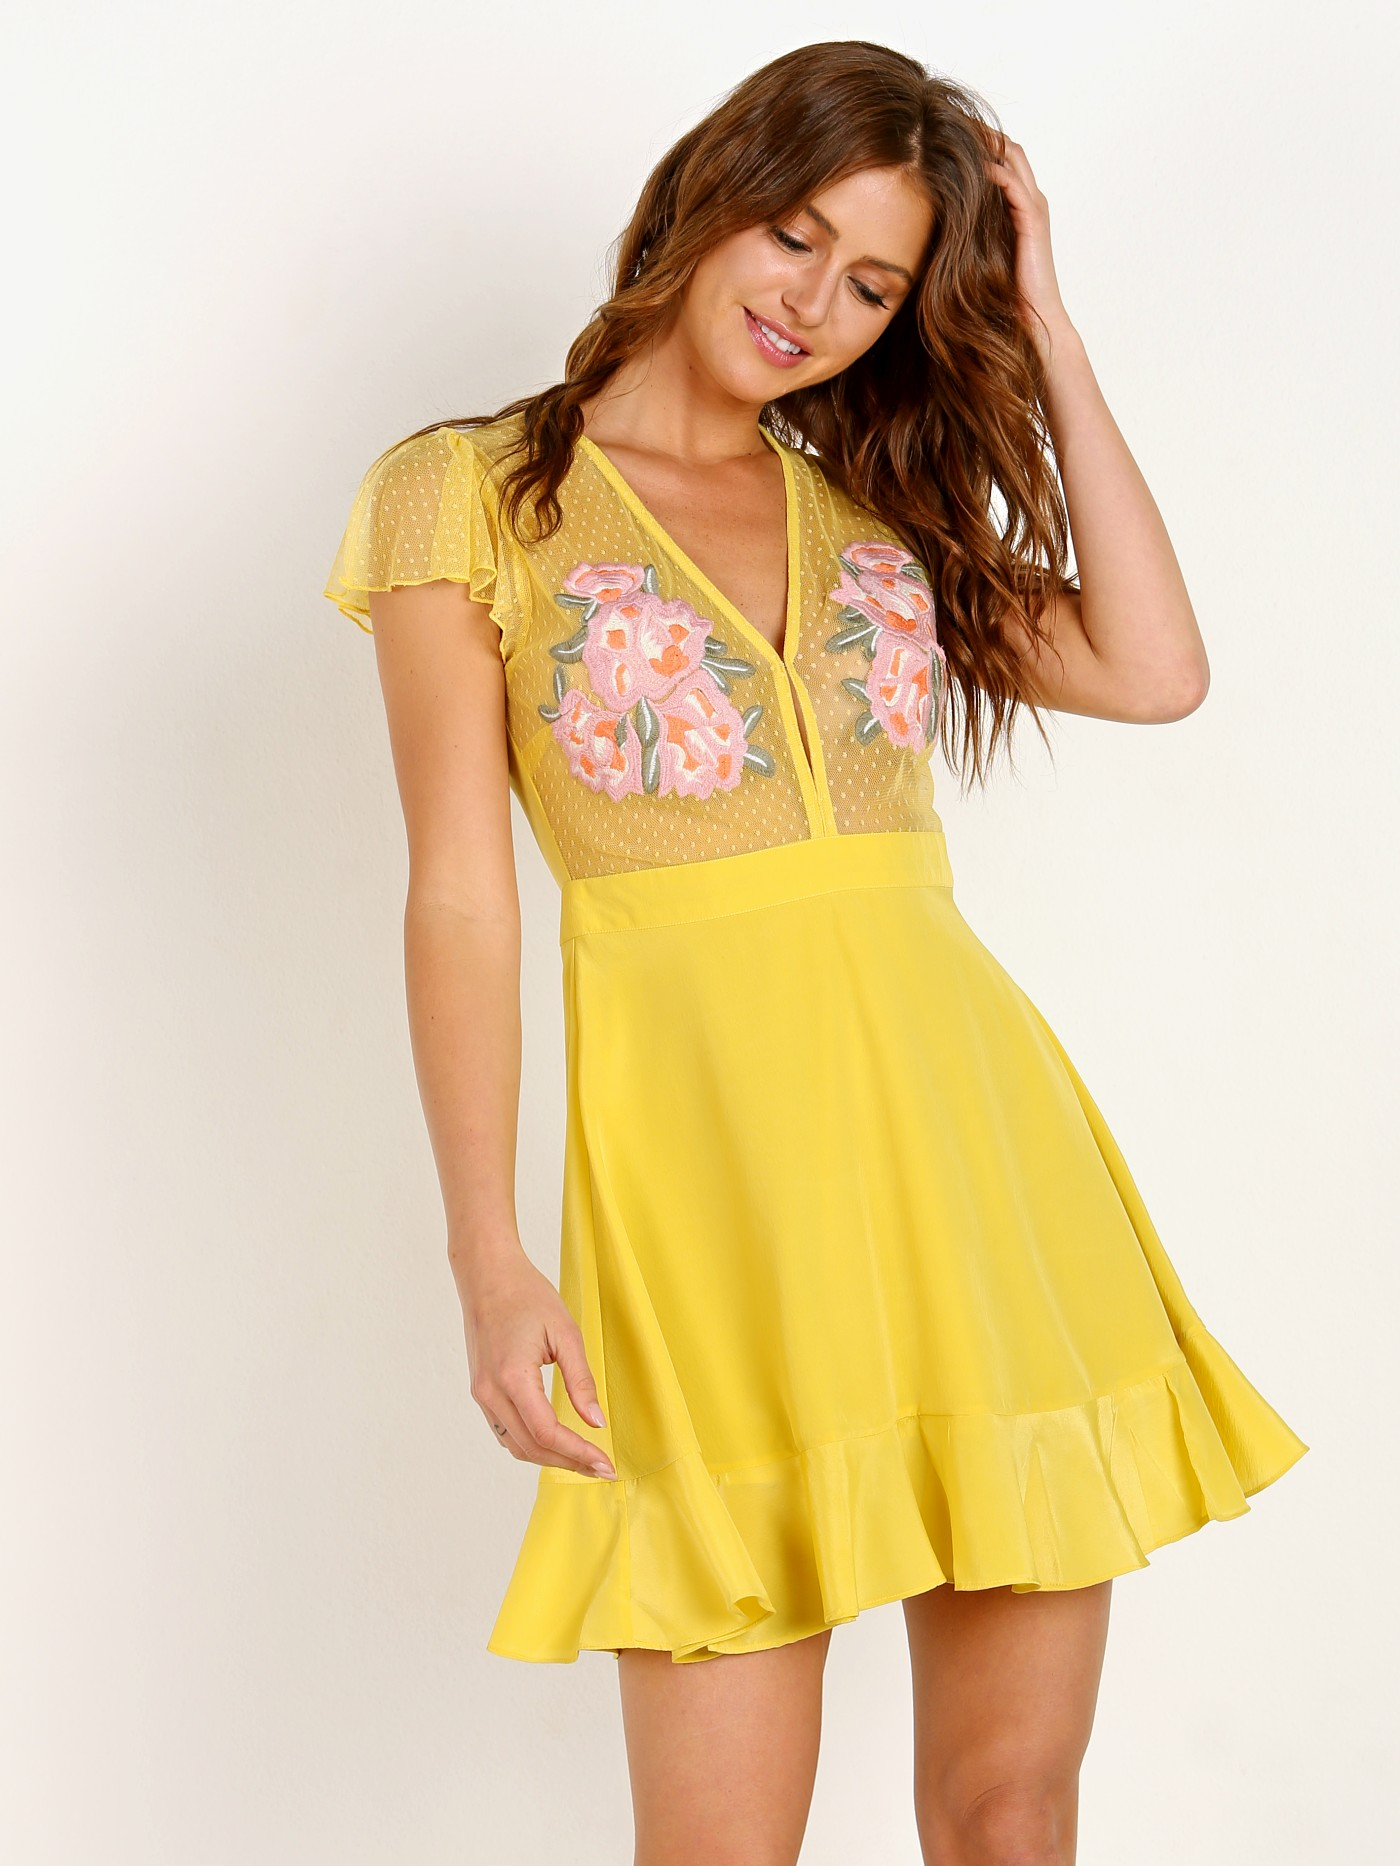 64b2980ee6 Cleobella Cooper Dress Chartreuse CRCSP1823 - Free Shipping at Largo Drive